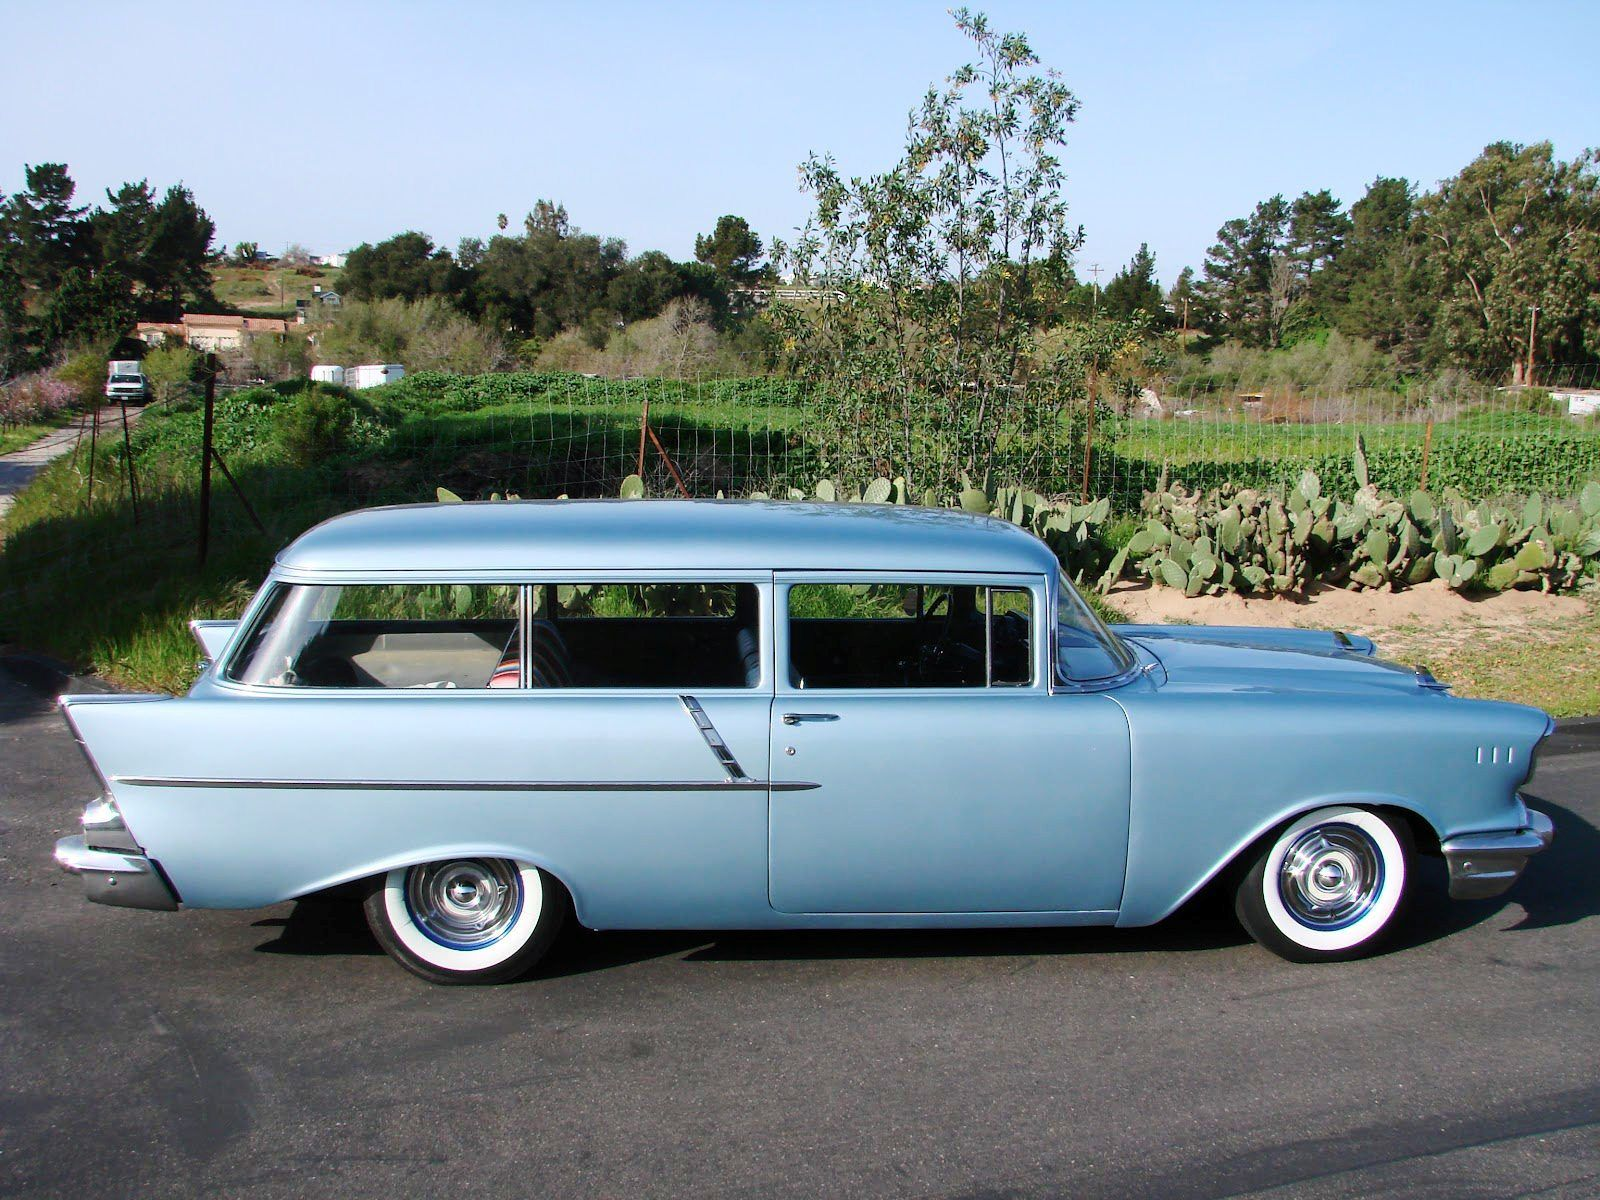 1957 Chevrolet 150 Handyman Station Wagon Station Wagon Classic Cars Trucks Station Wagon Cars